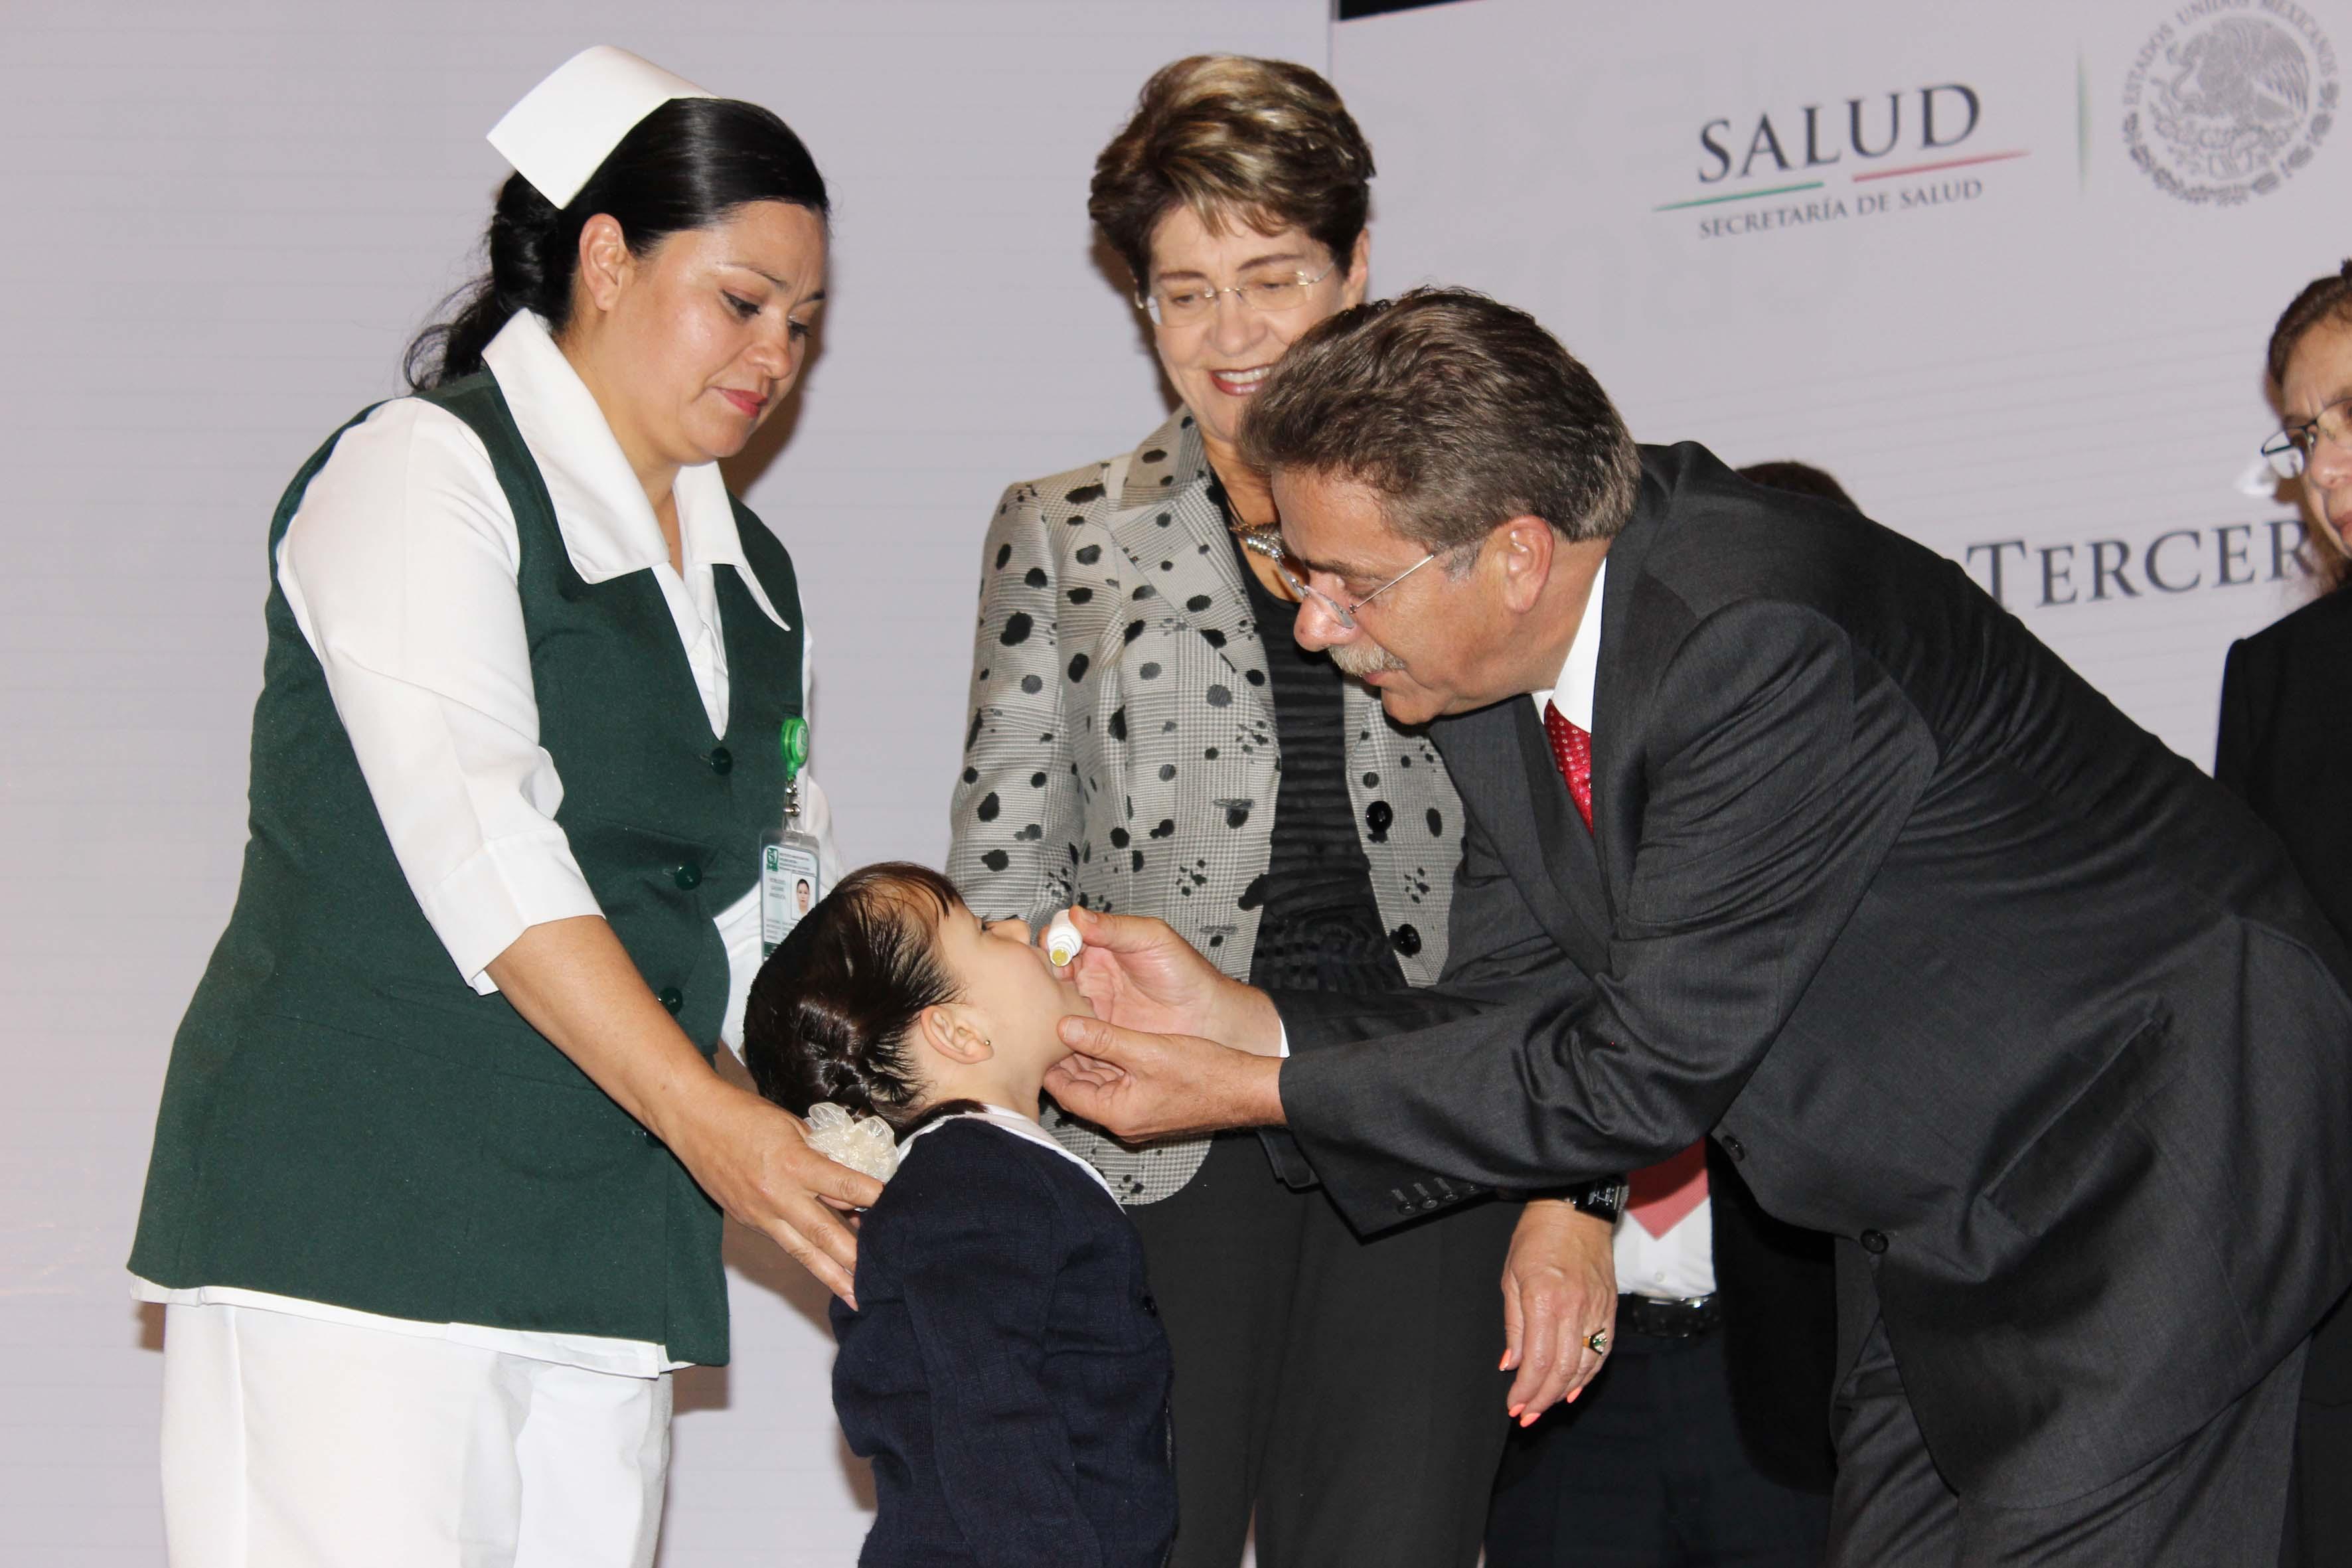 Tercera Semana Nacional de Salud 2014 SLP  3 jpg